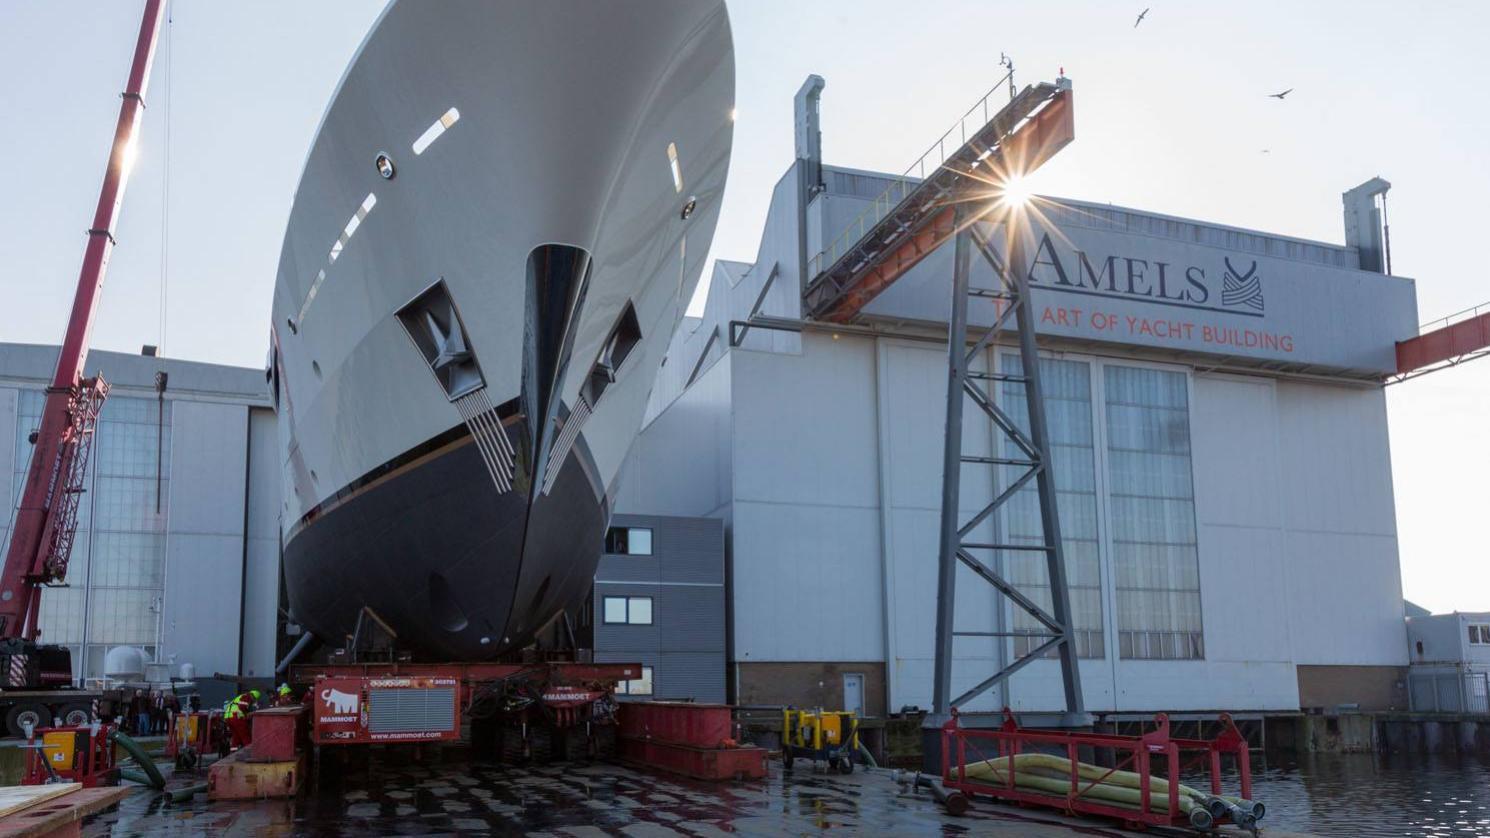 elixir-motor-yacht-amels-2016-55m-front-dock